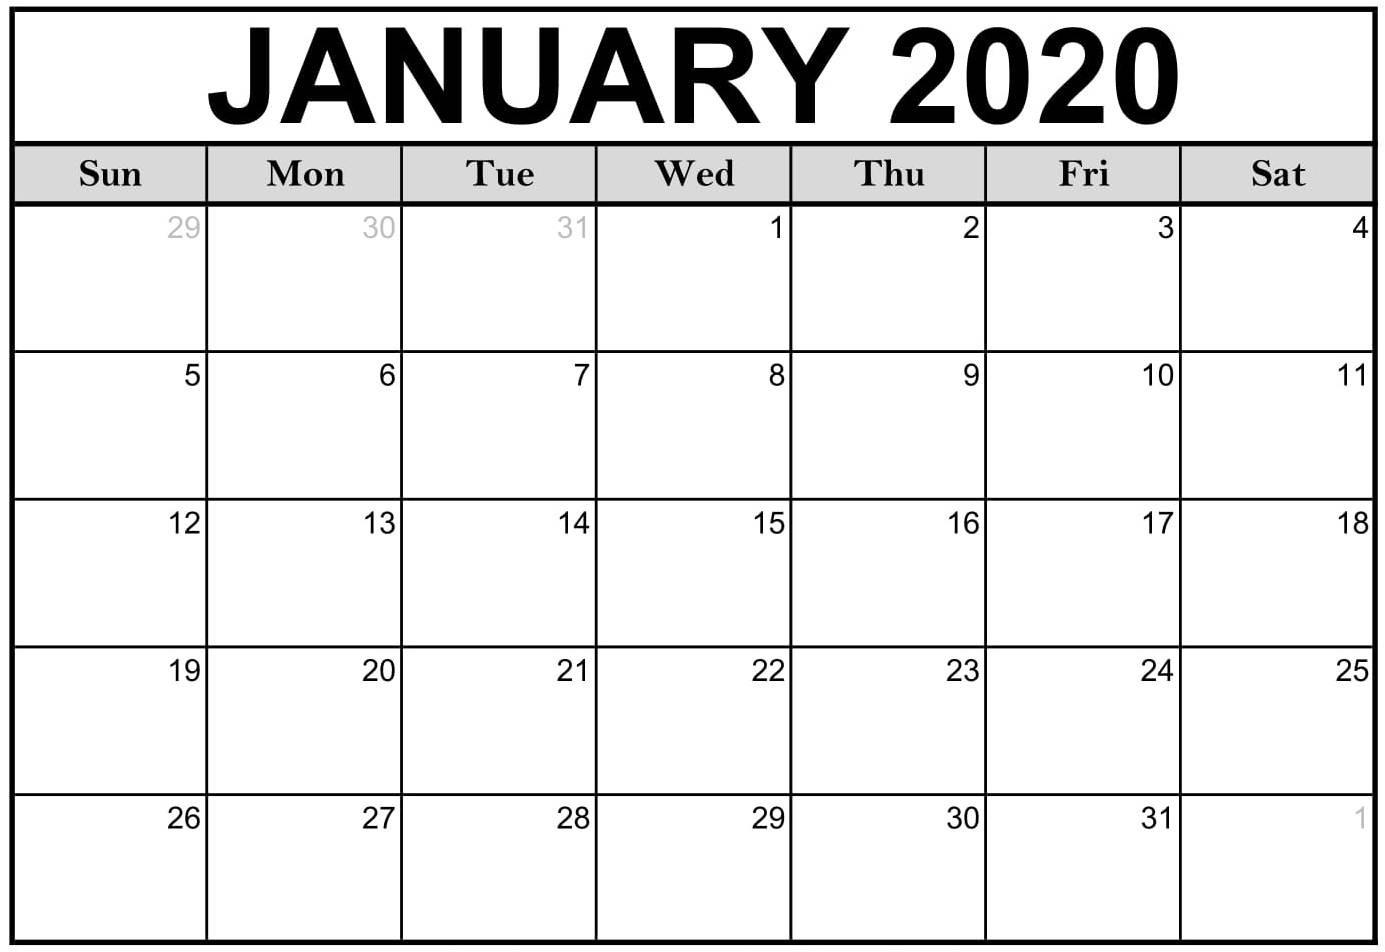 Print Calendar Nz 2020 | Calendar Printables Free Templates  Free Printable Blank Monthly Calendar Templates Editable